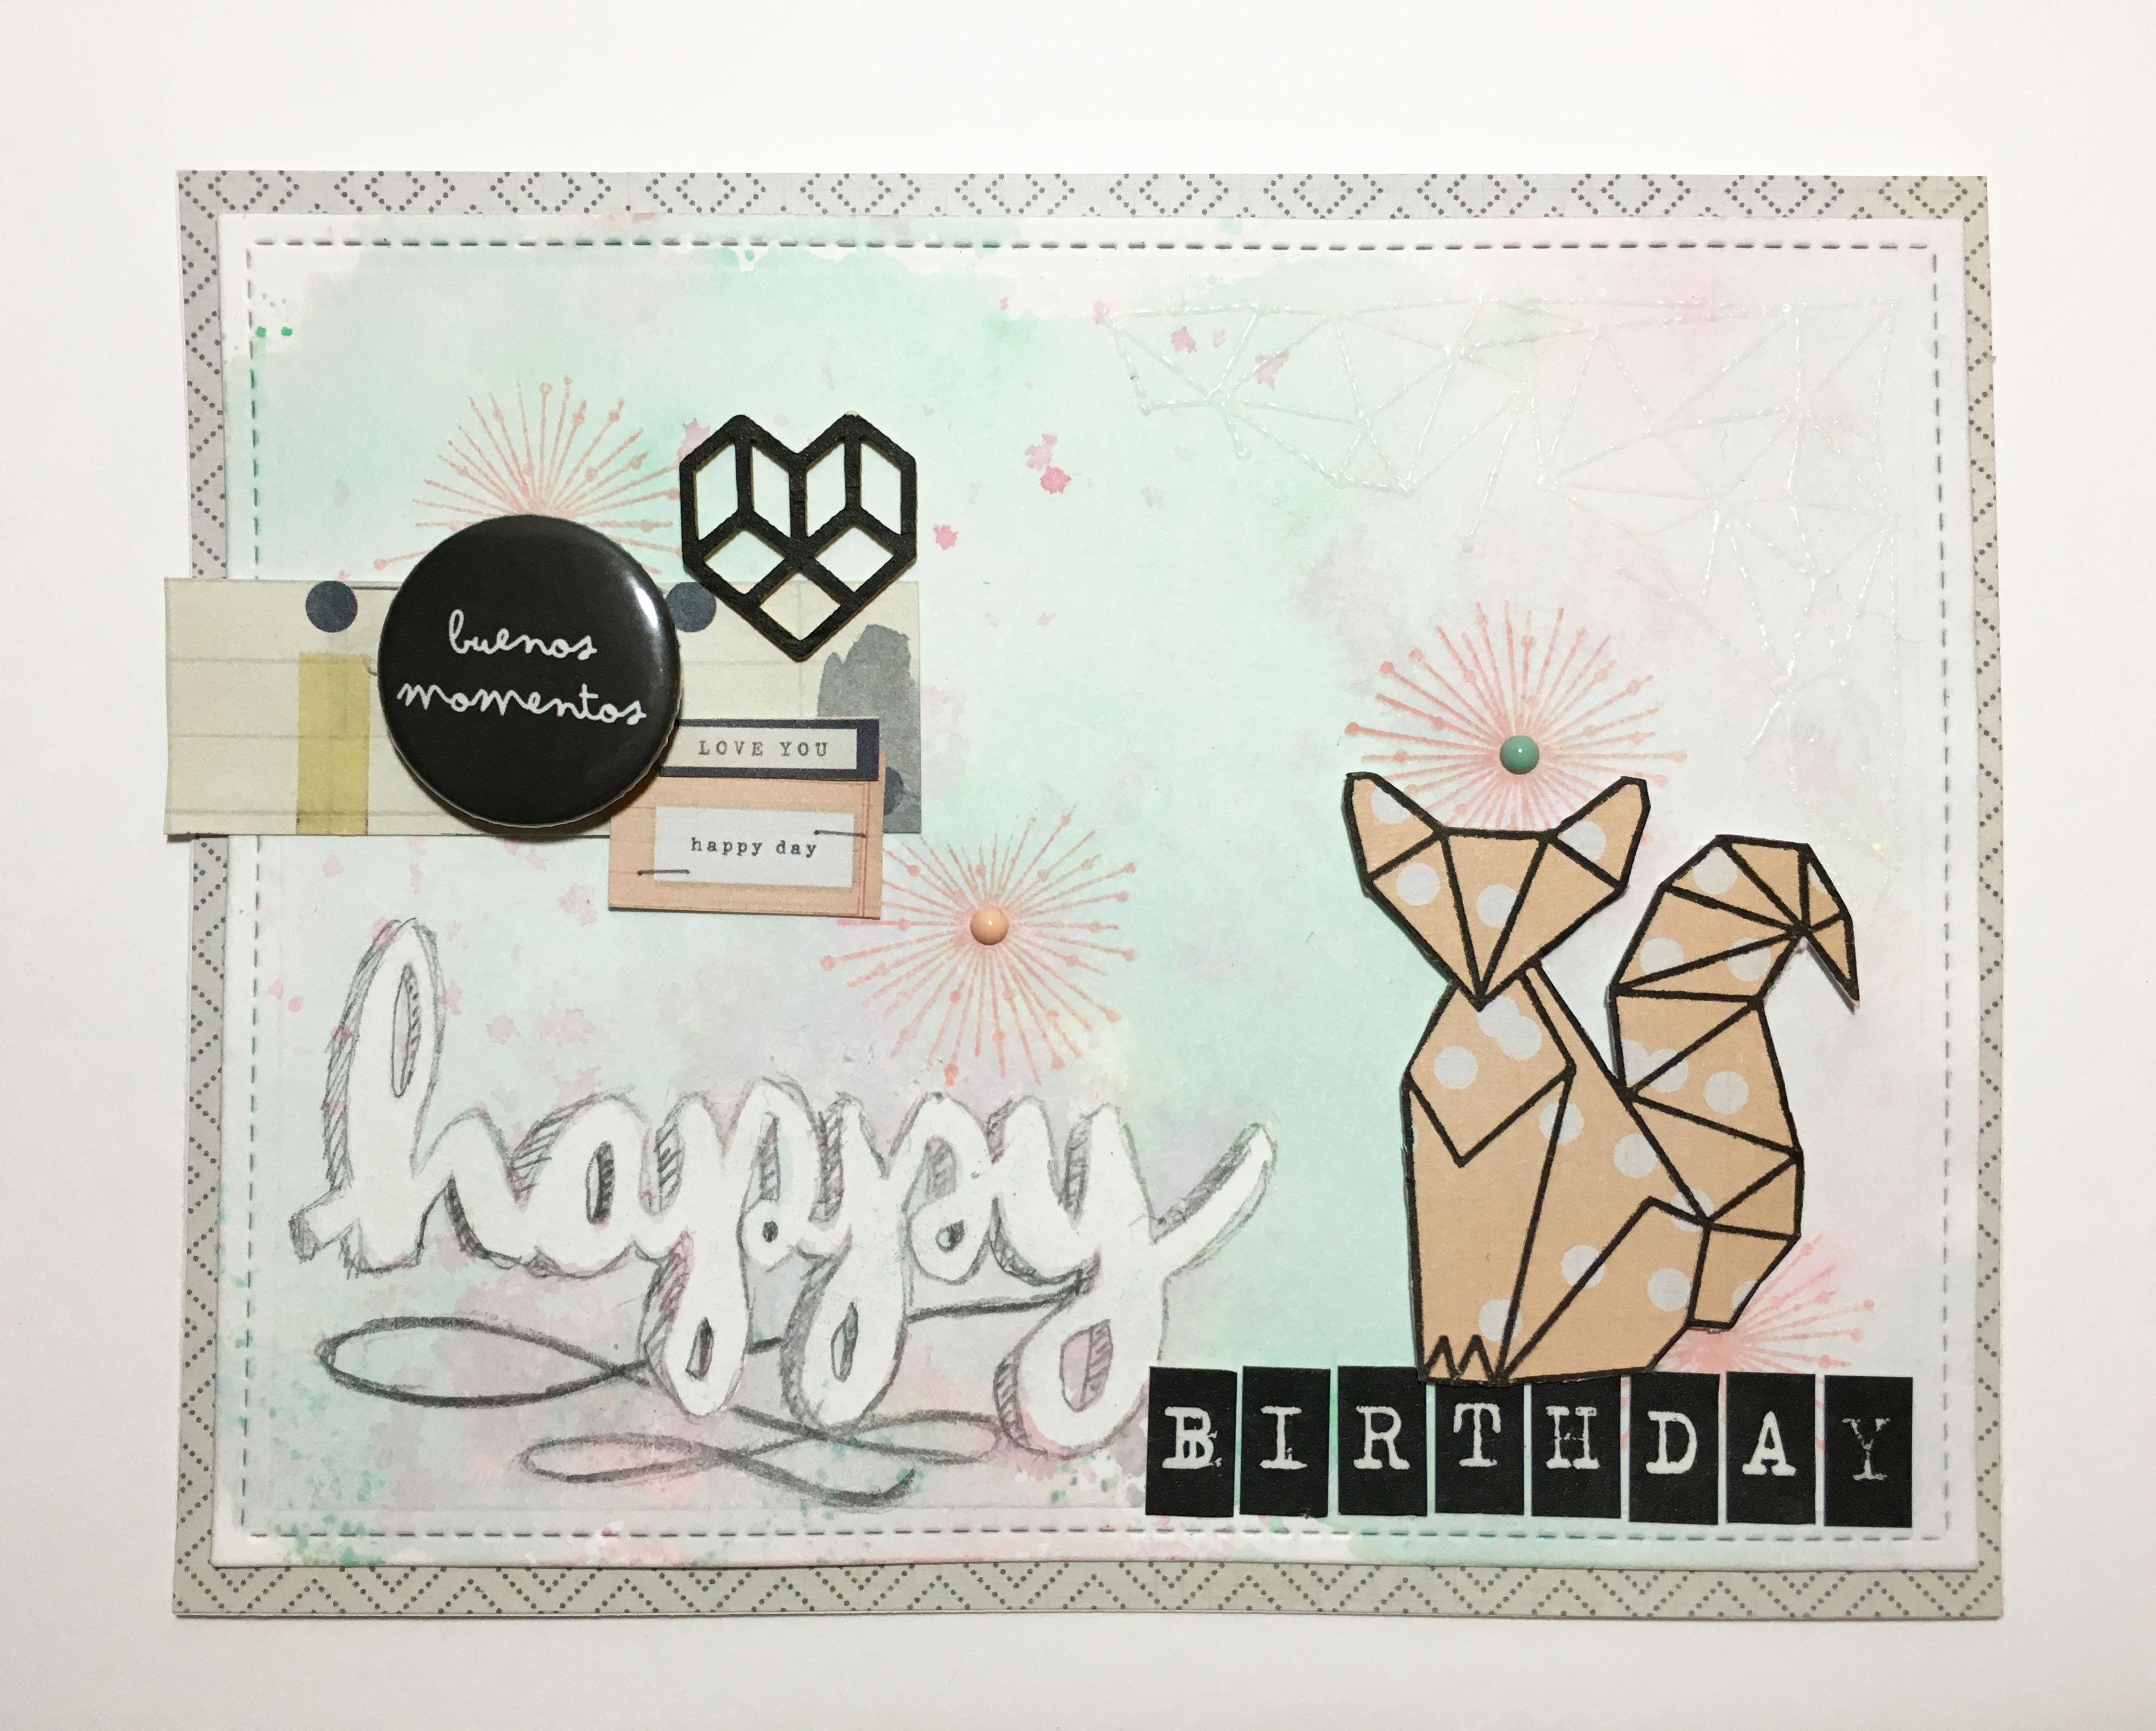 Gigietmoi_tarjeta cumpleaños_Lorena Penknives